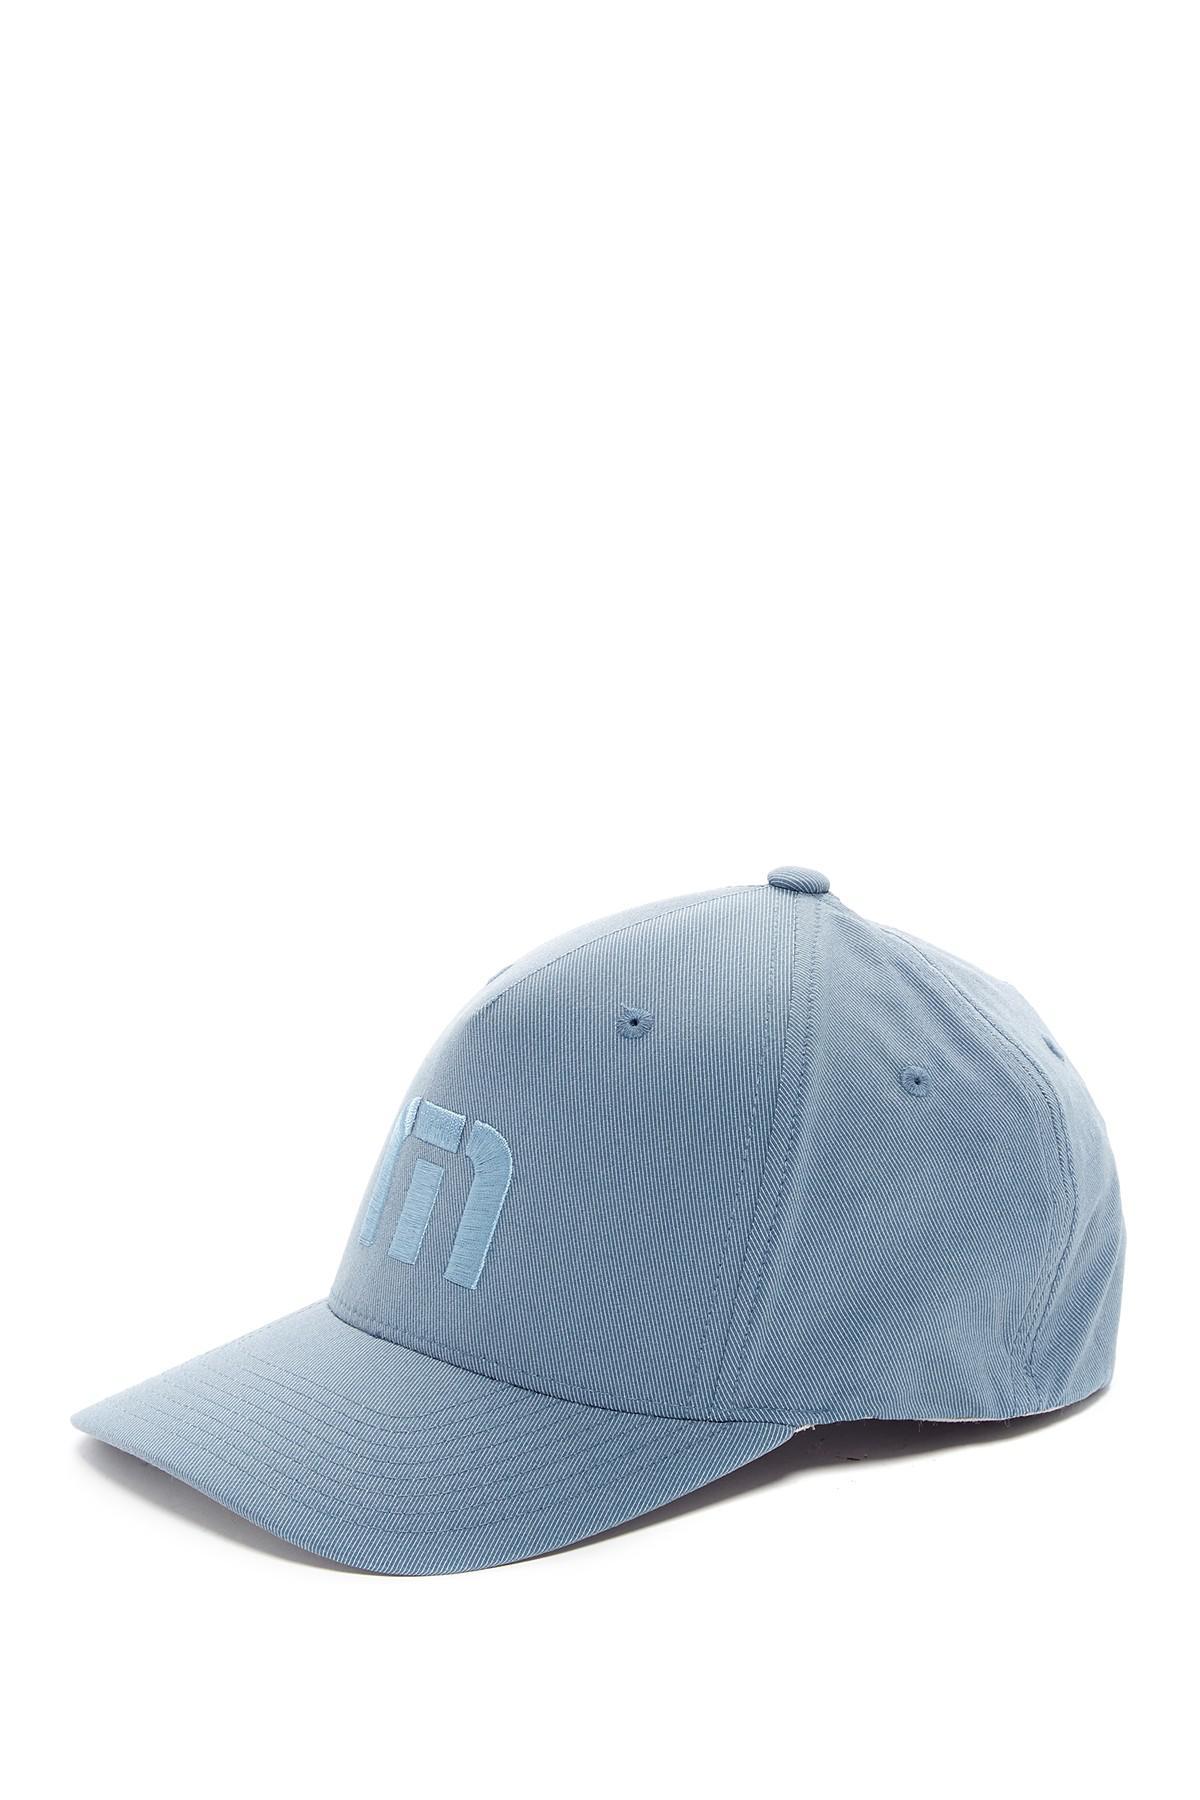 competitive price ead7c 72ec2 ... usa lyst travis mathew hawthorne baseball cap in blue for men f2d5d  8c2ab